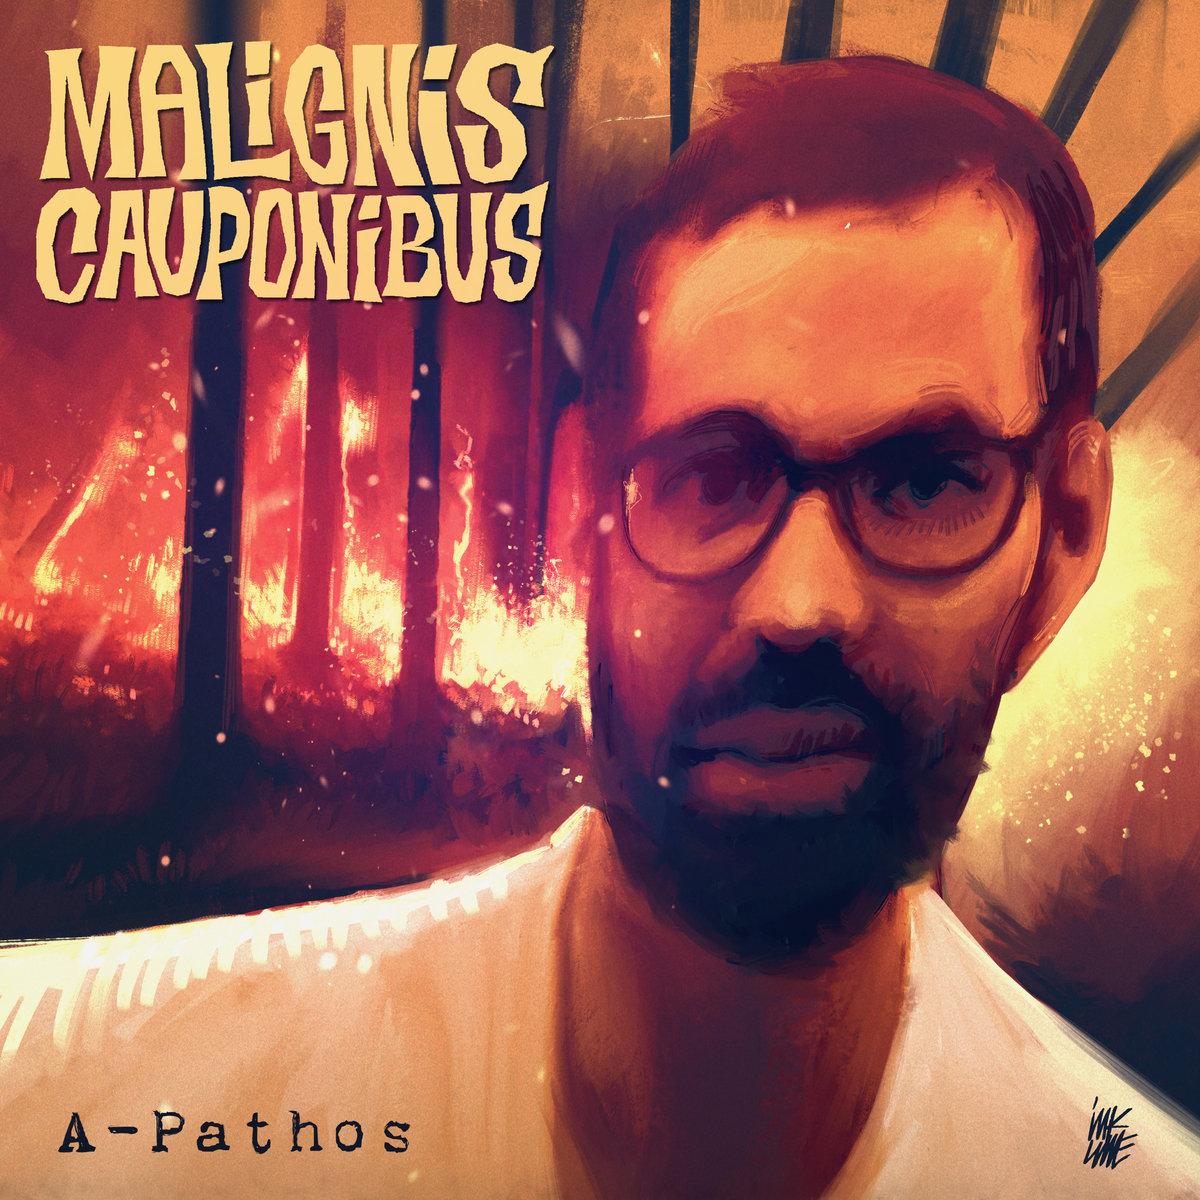 Malignis Cauponibus - A-Pathos - Luca Marcia - blues - San Sperate - 2019 - Sa Scena Sarda - Solid Music